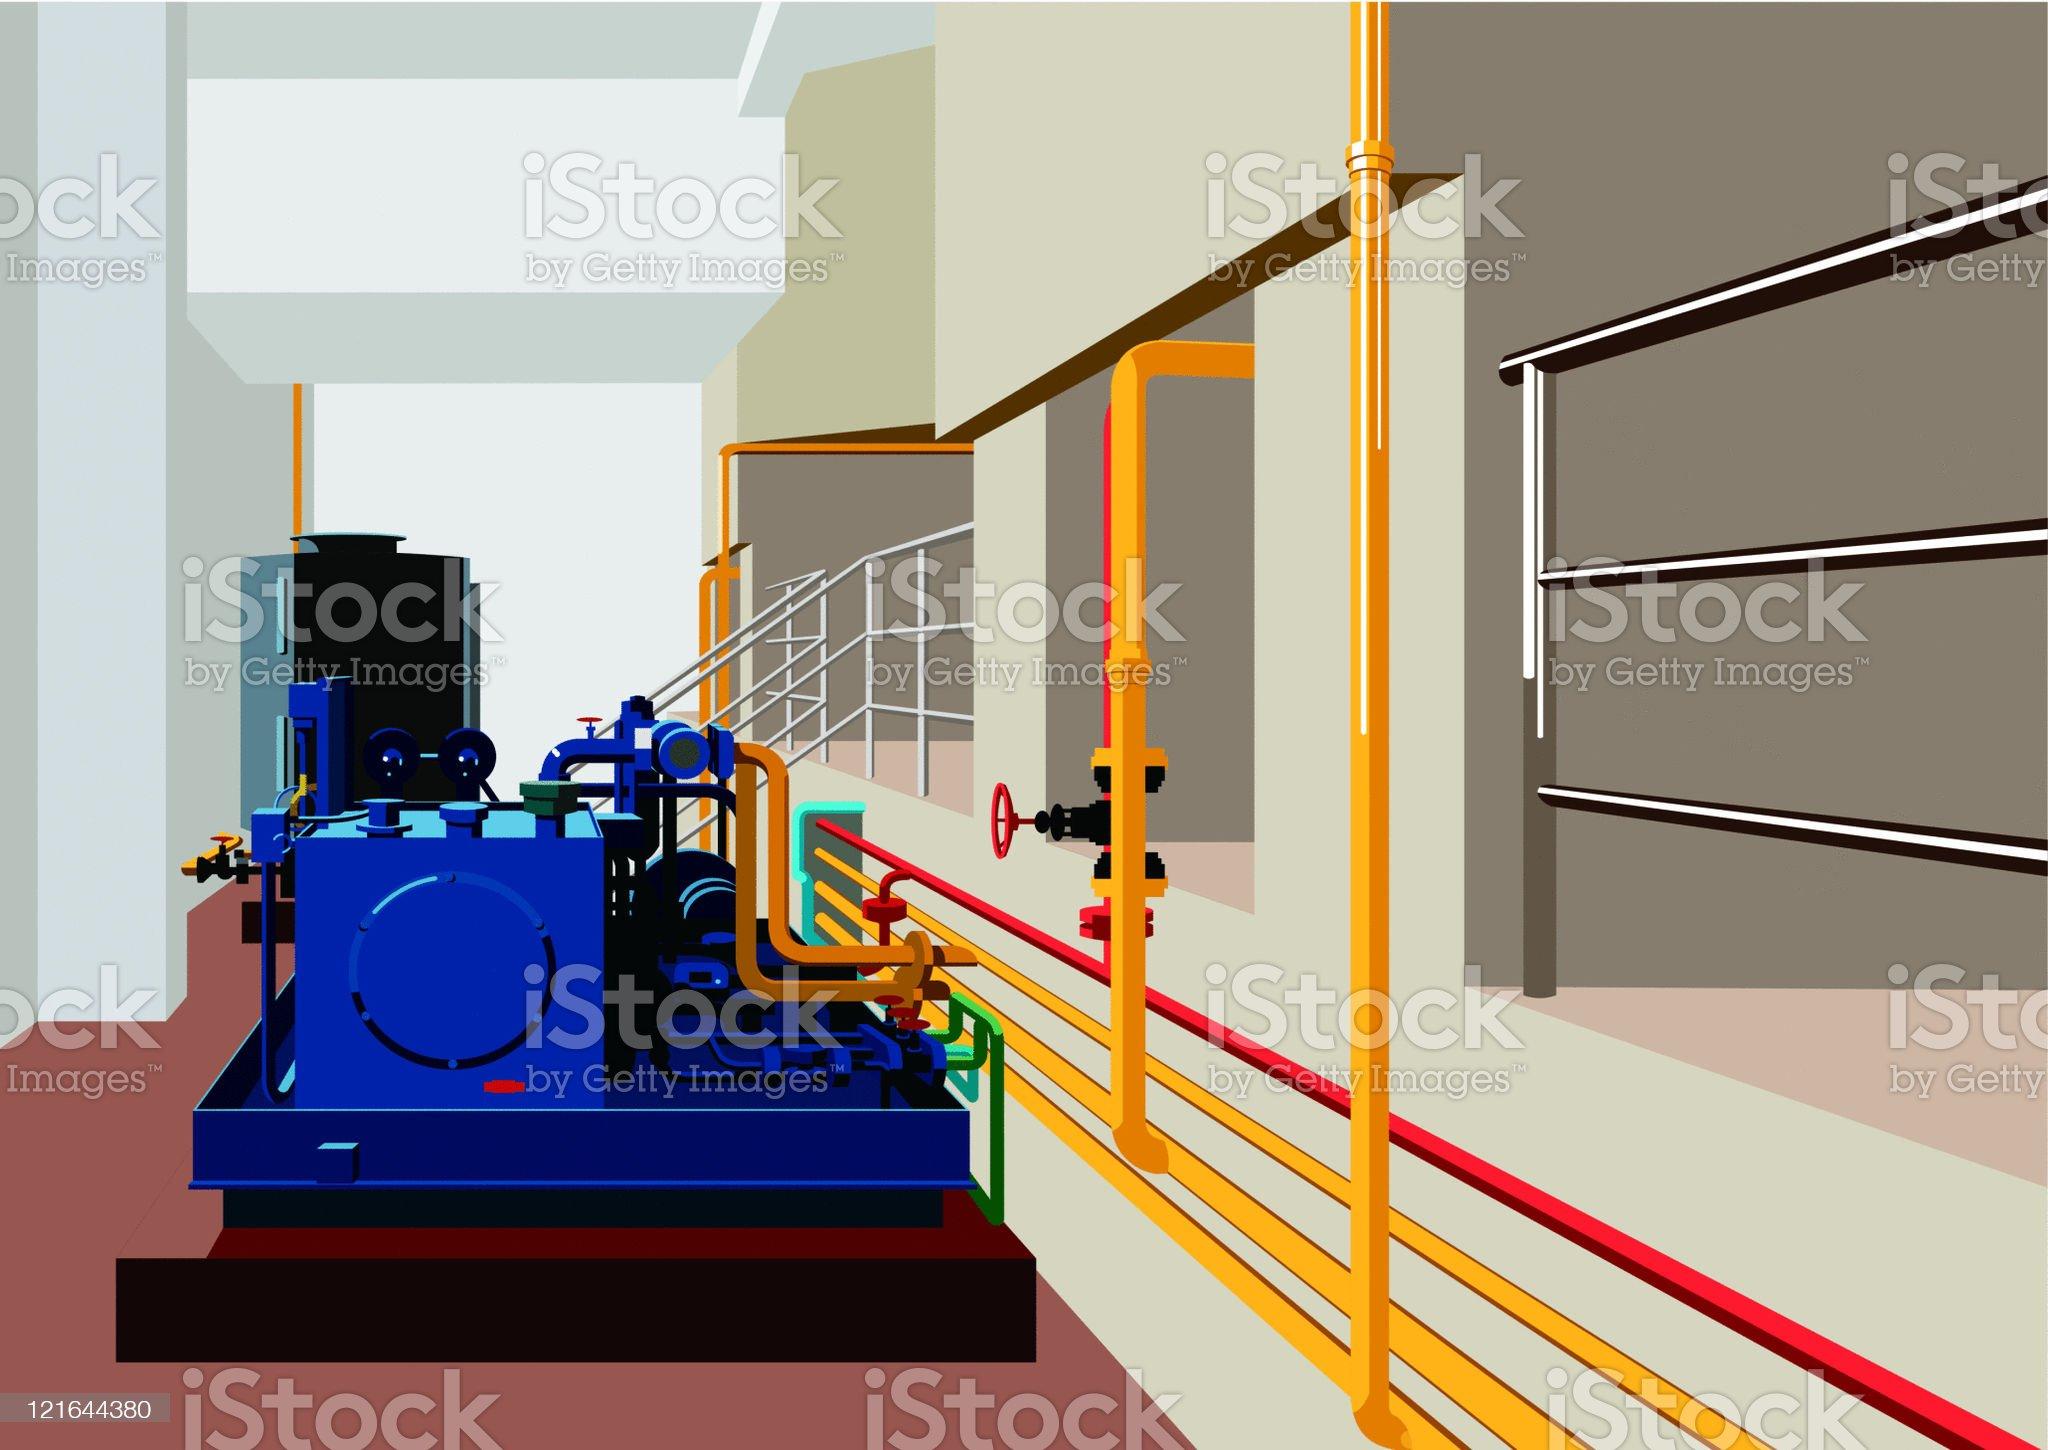 pipe and  machine equipment royalty-free stock vector art